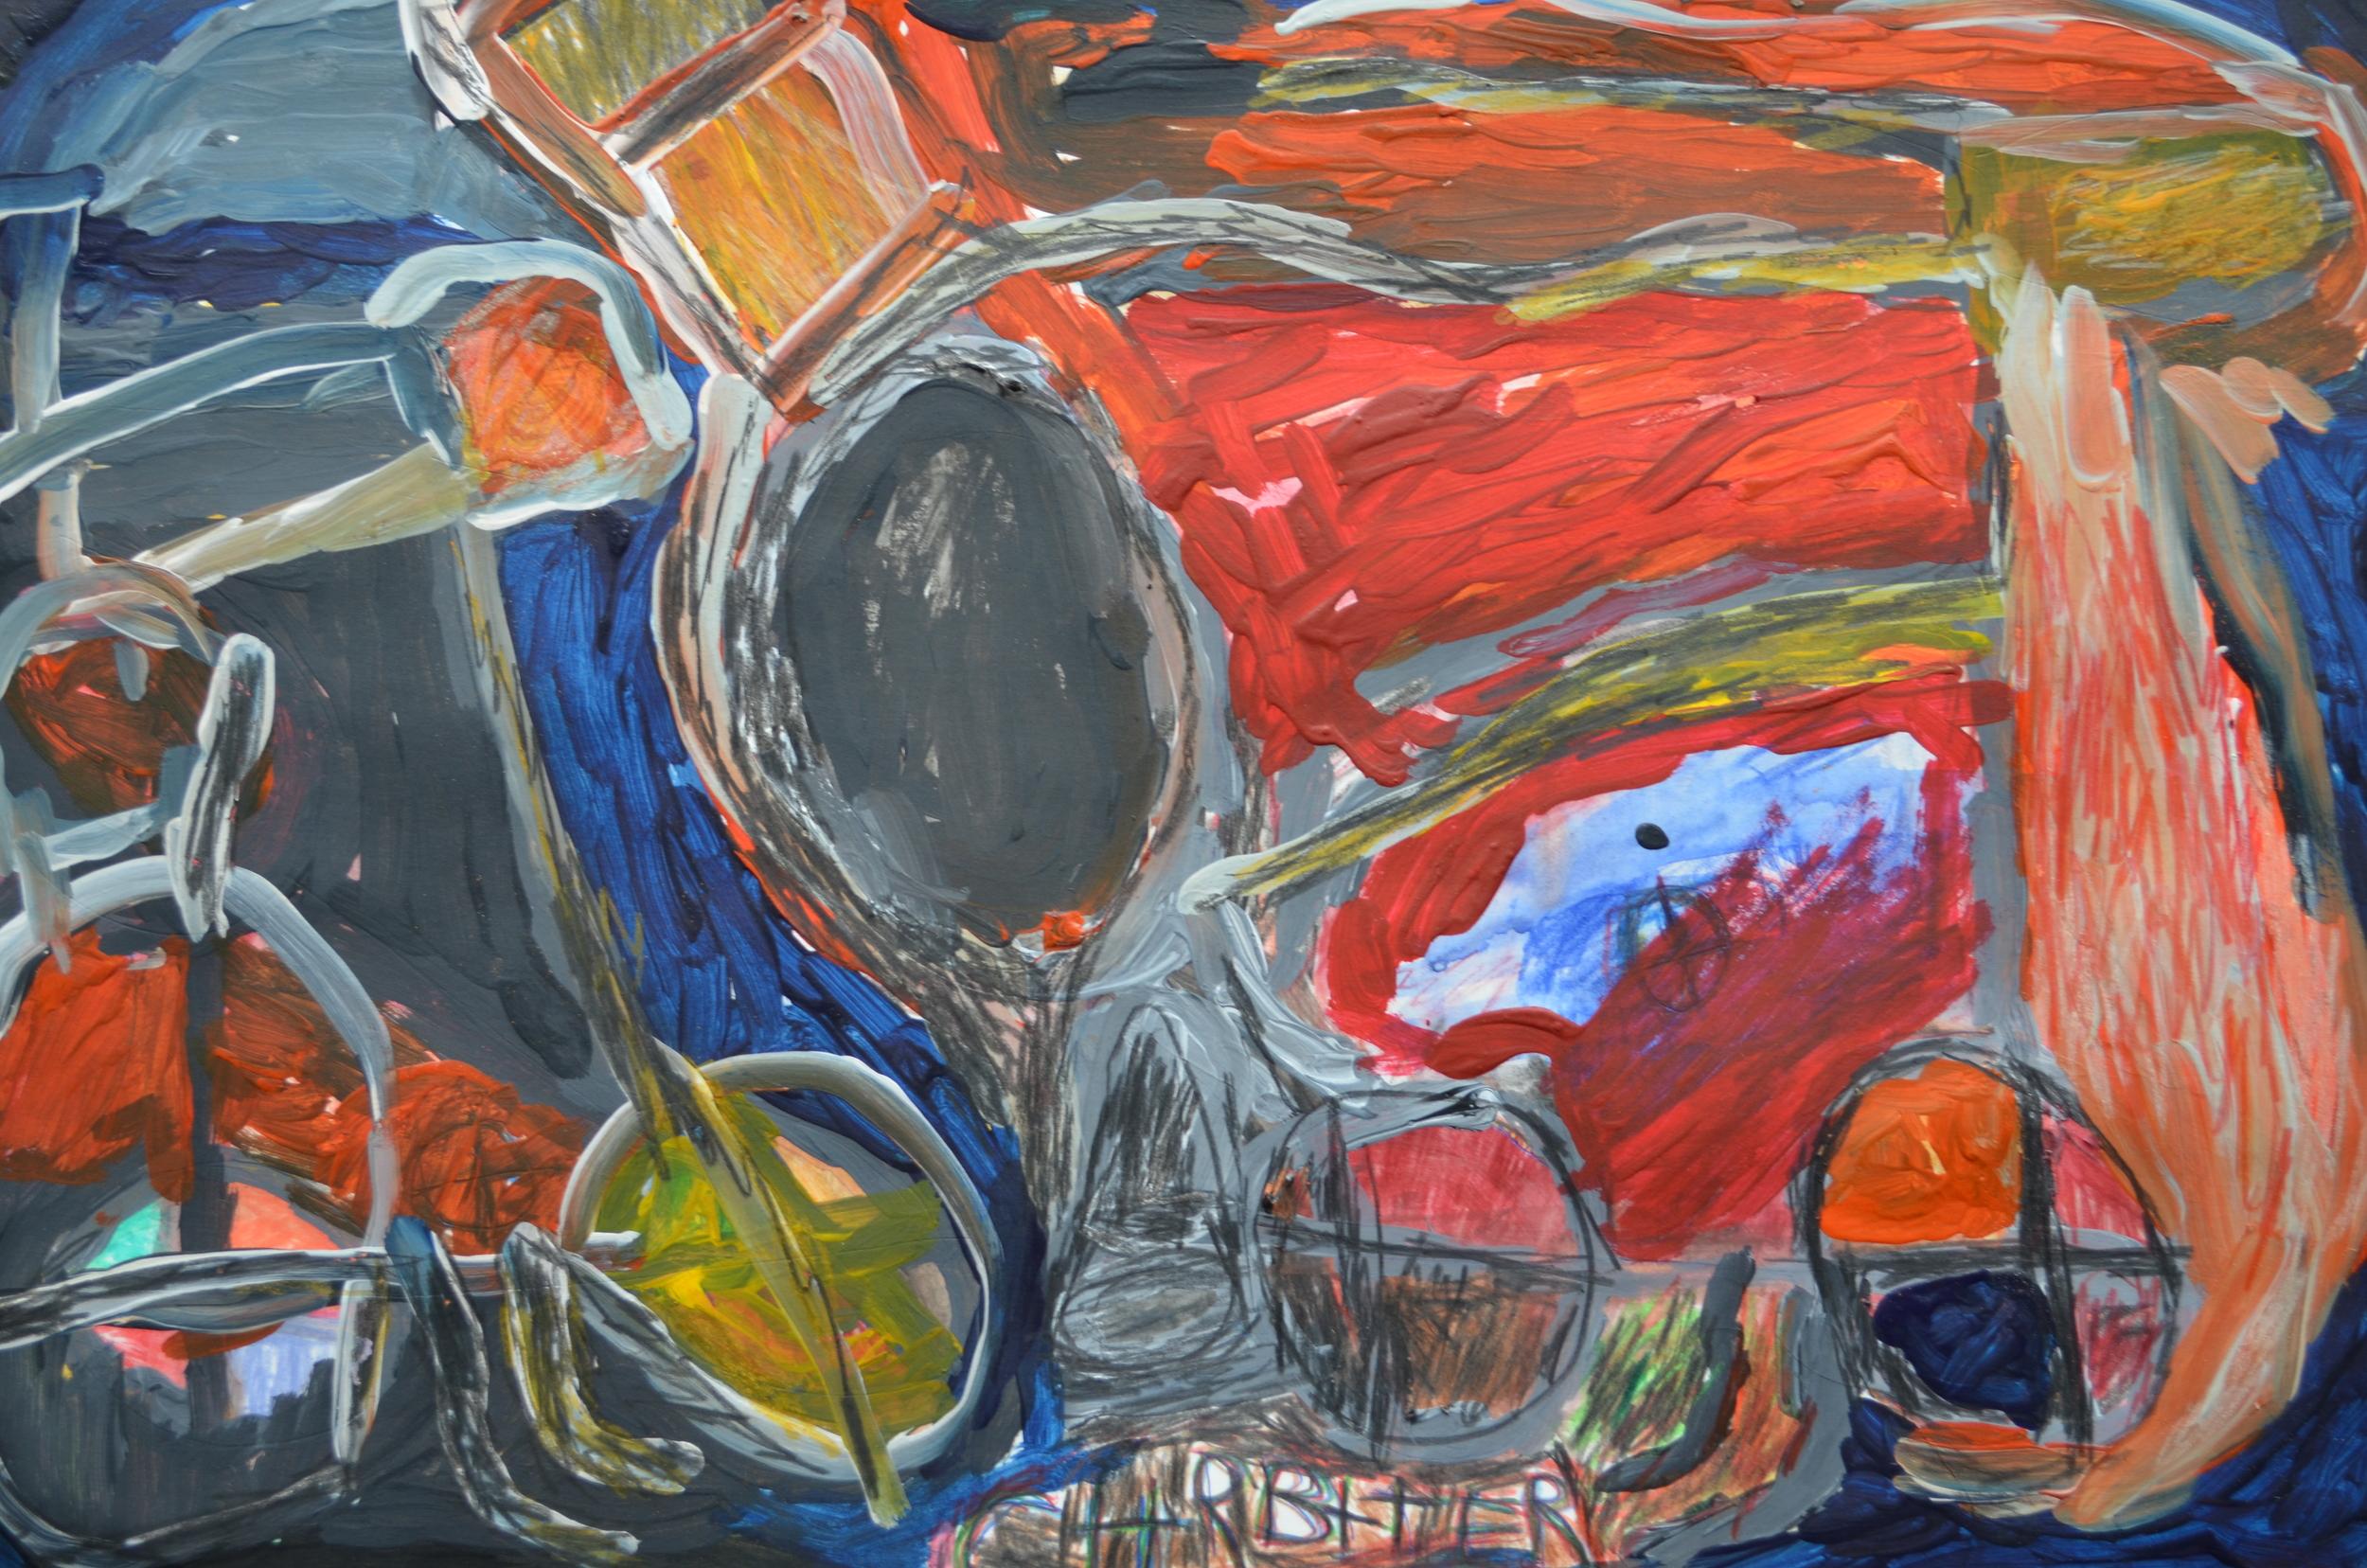 Chris Baxter, Untitled, 2015